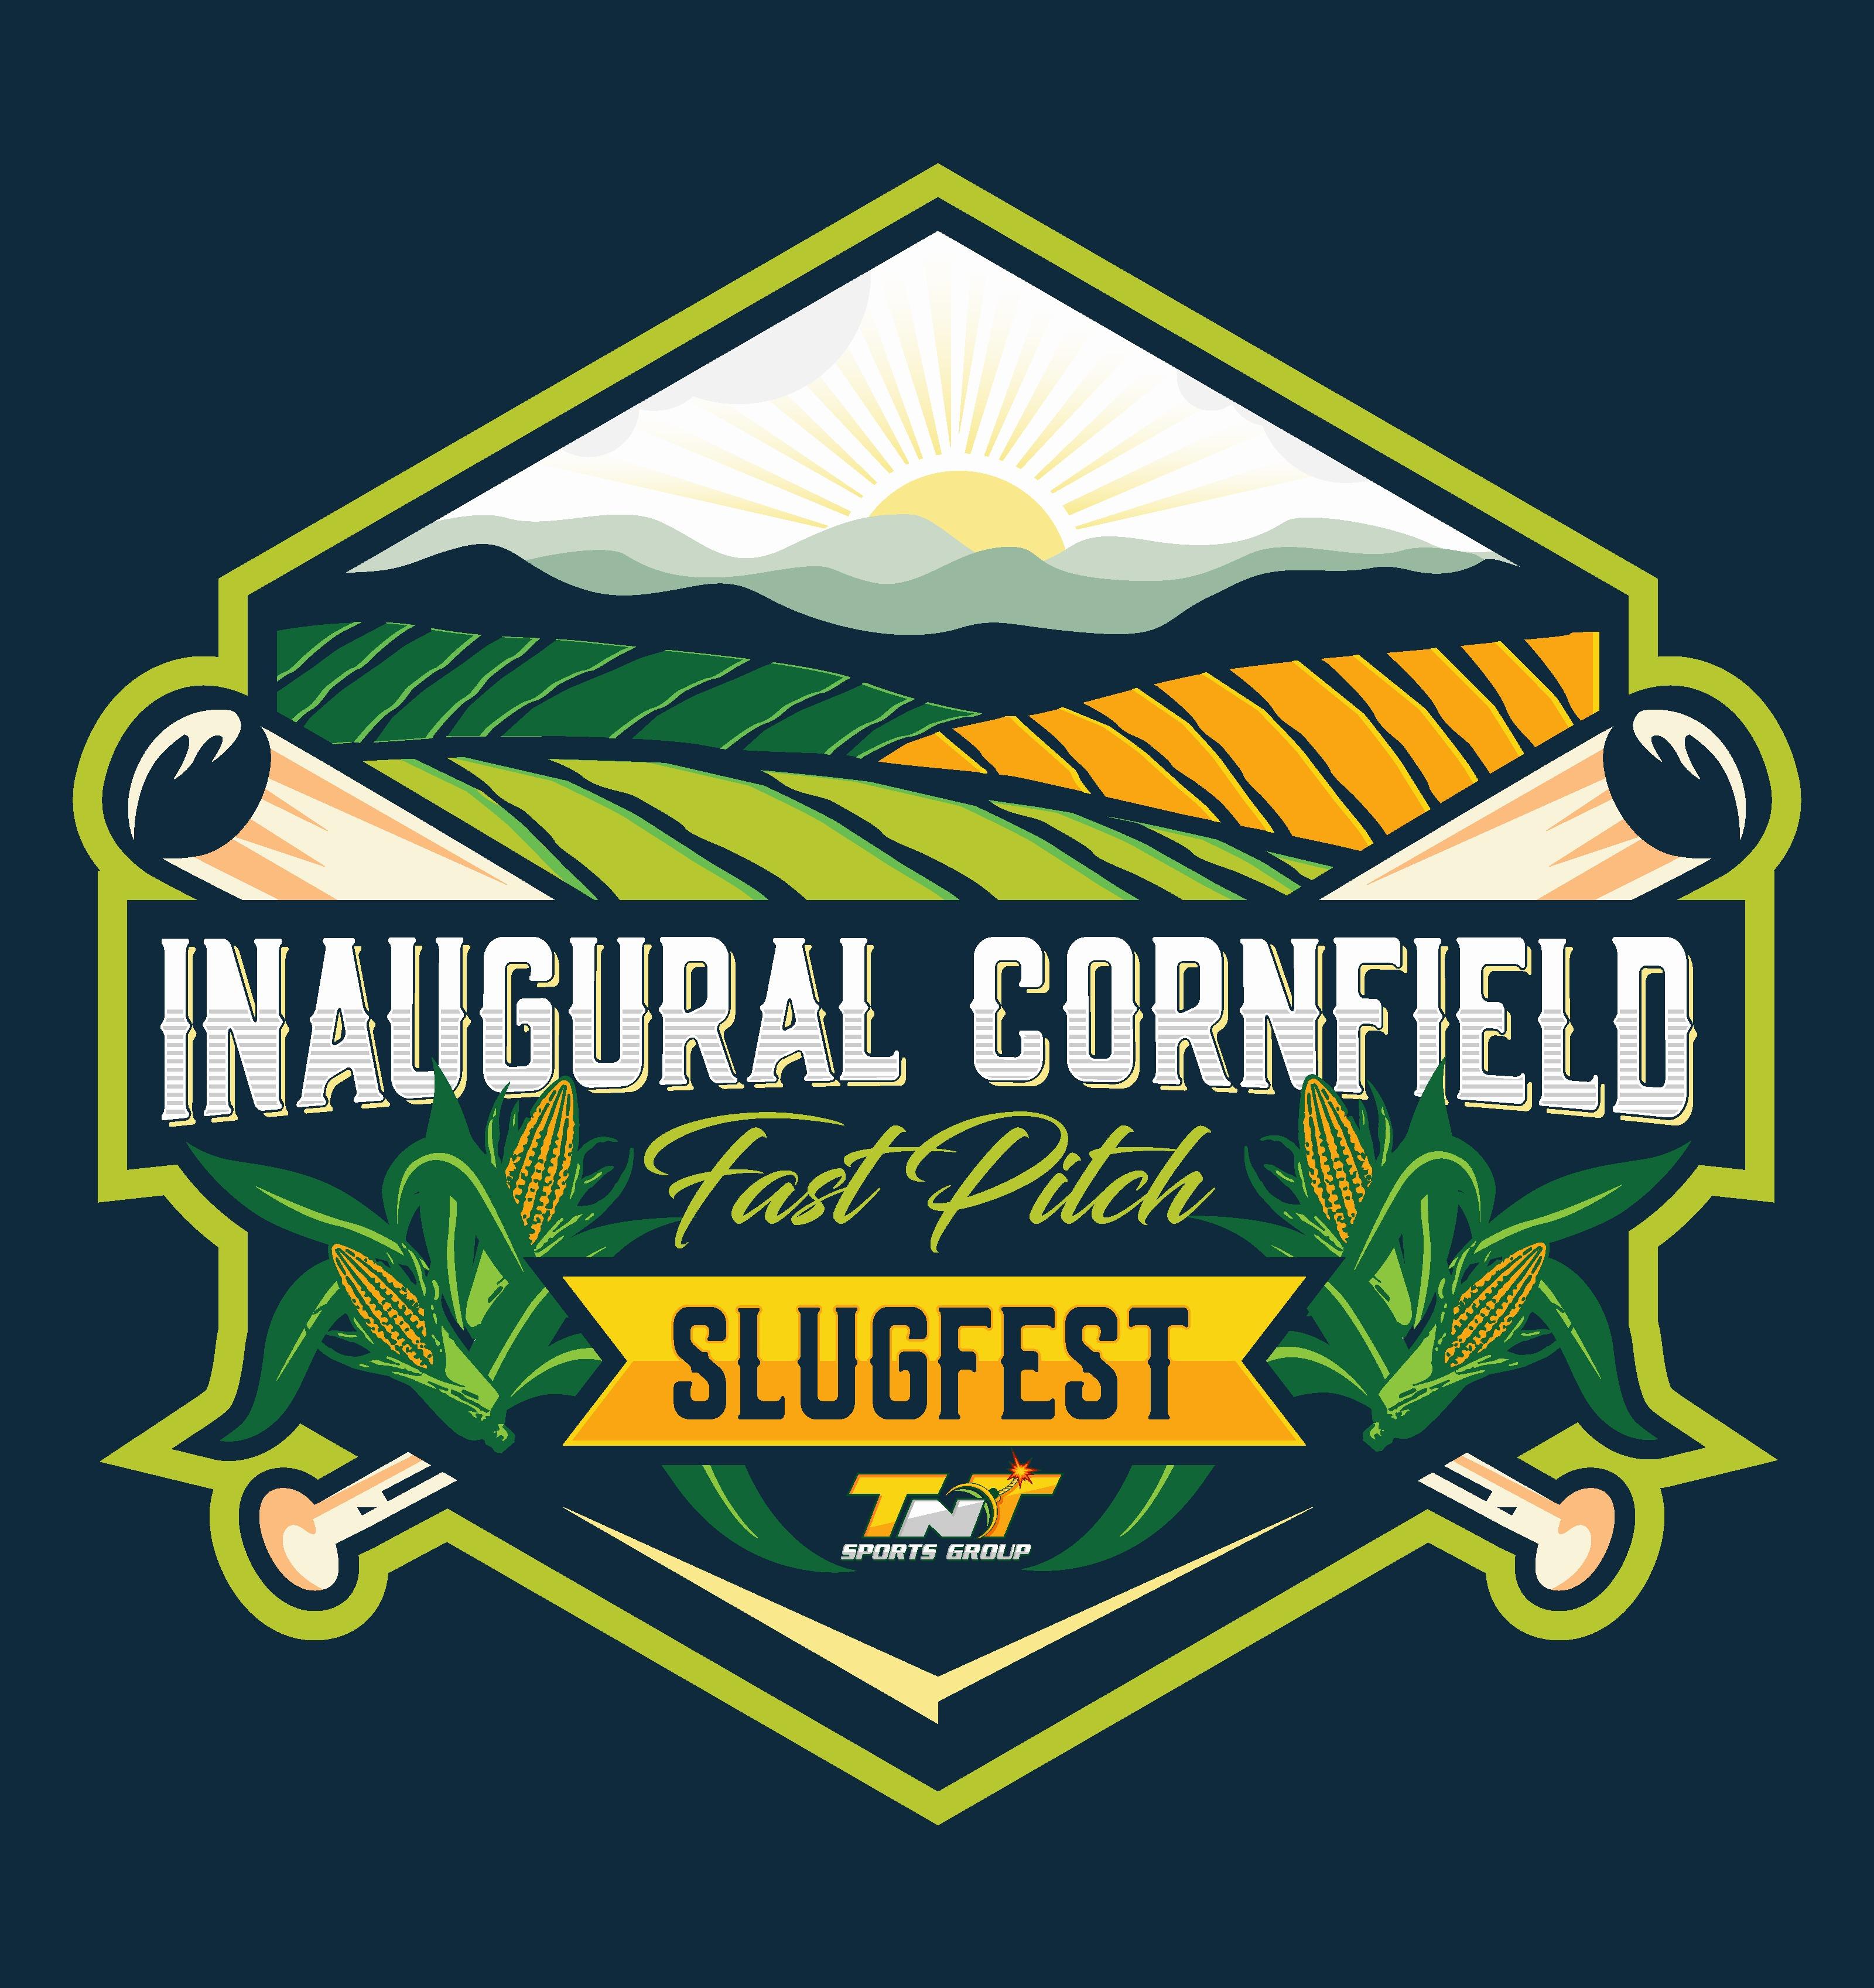 TNT Sports Group Inaugural Cornfield Fast Pitch Slugfest